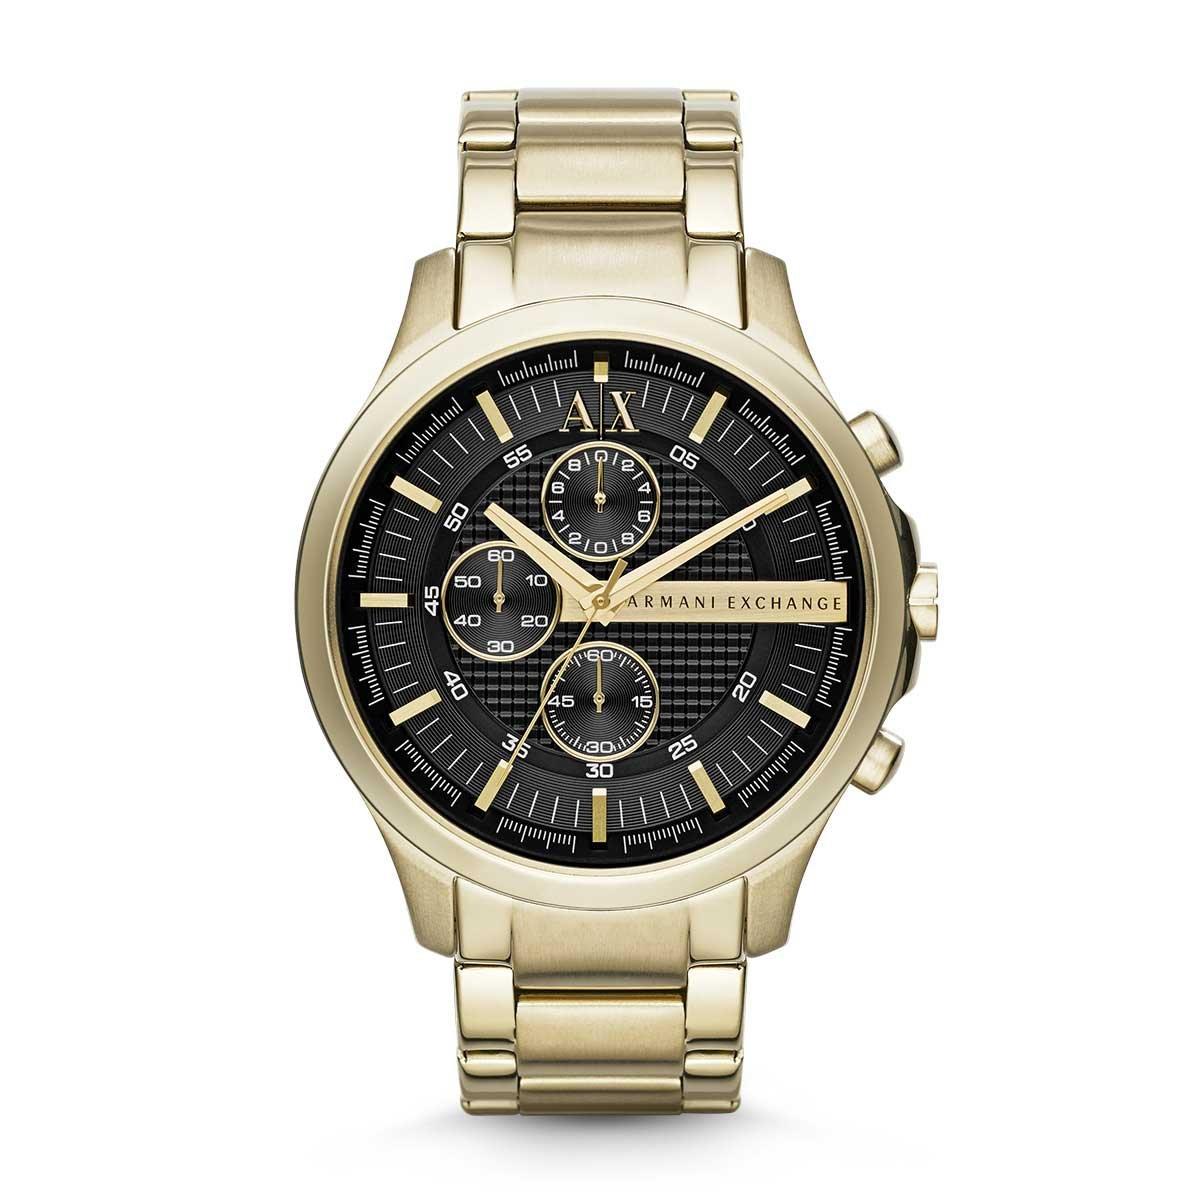 83ec5dea5933 Reloj Caballero Armani Exchange AX2137